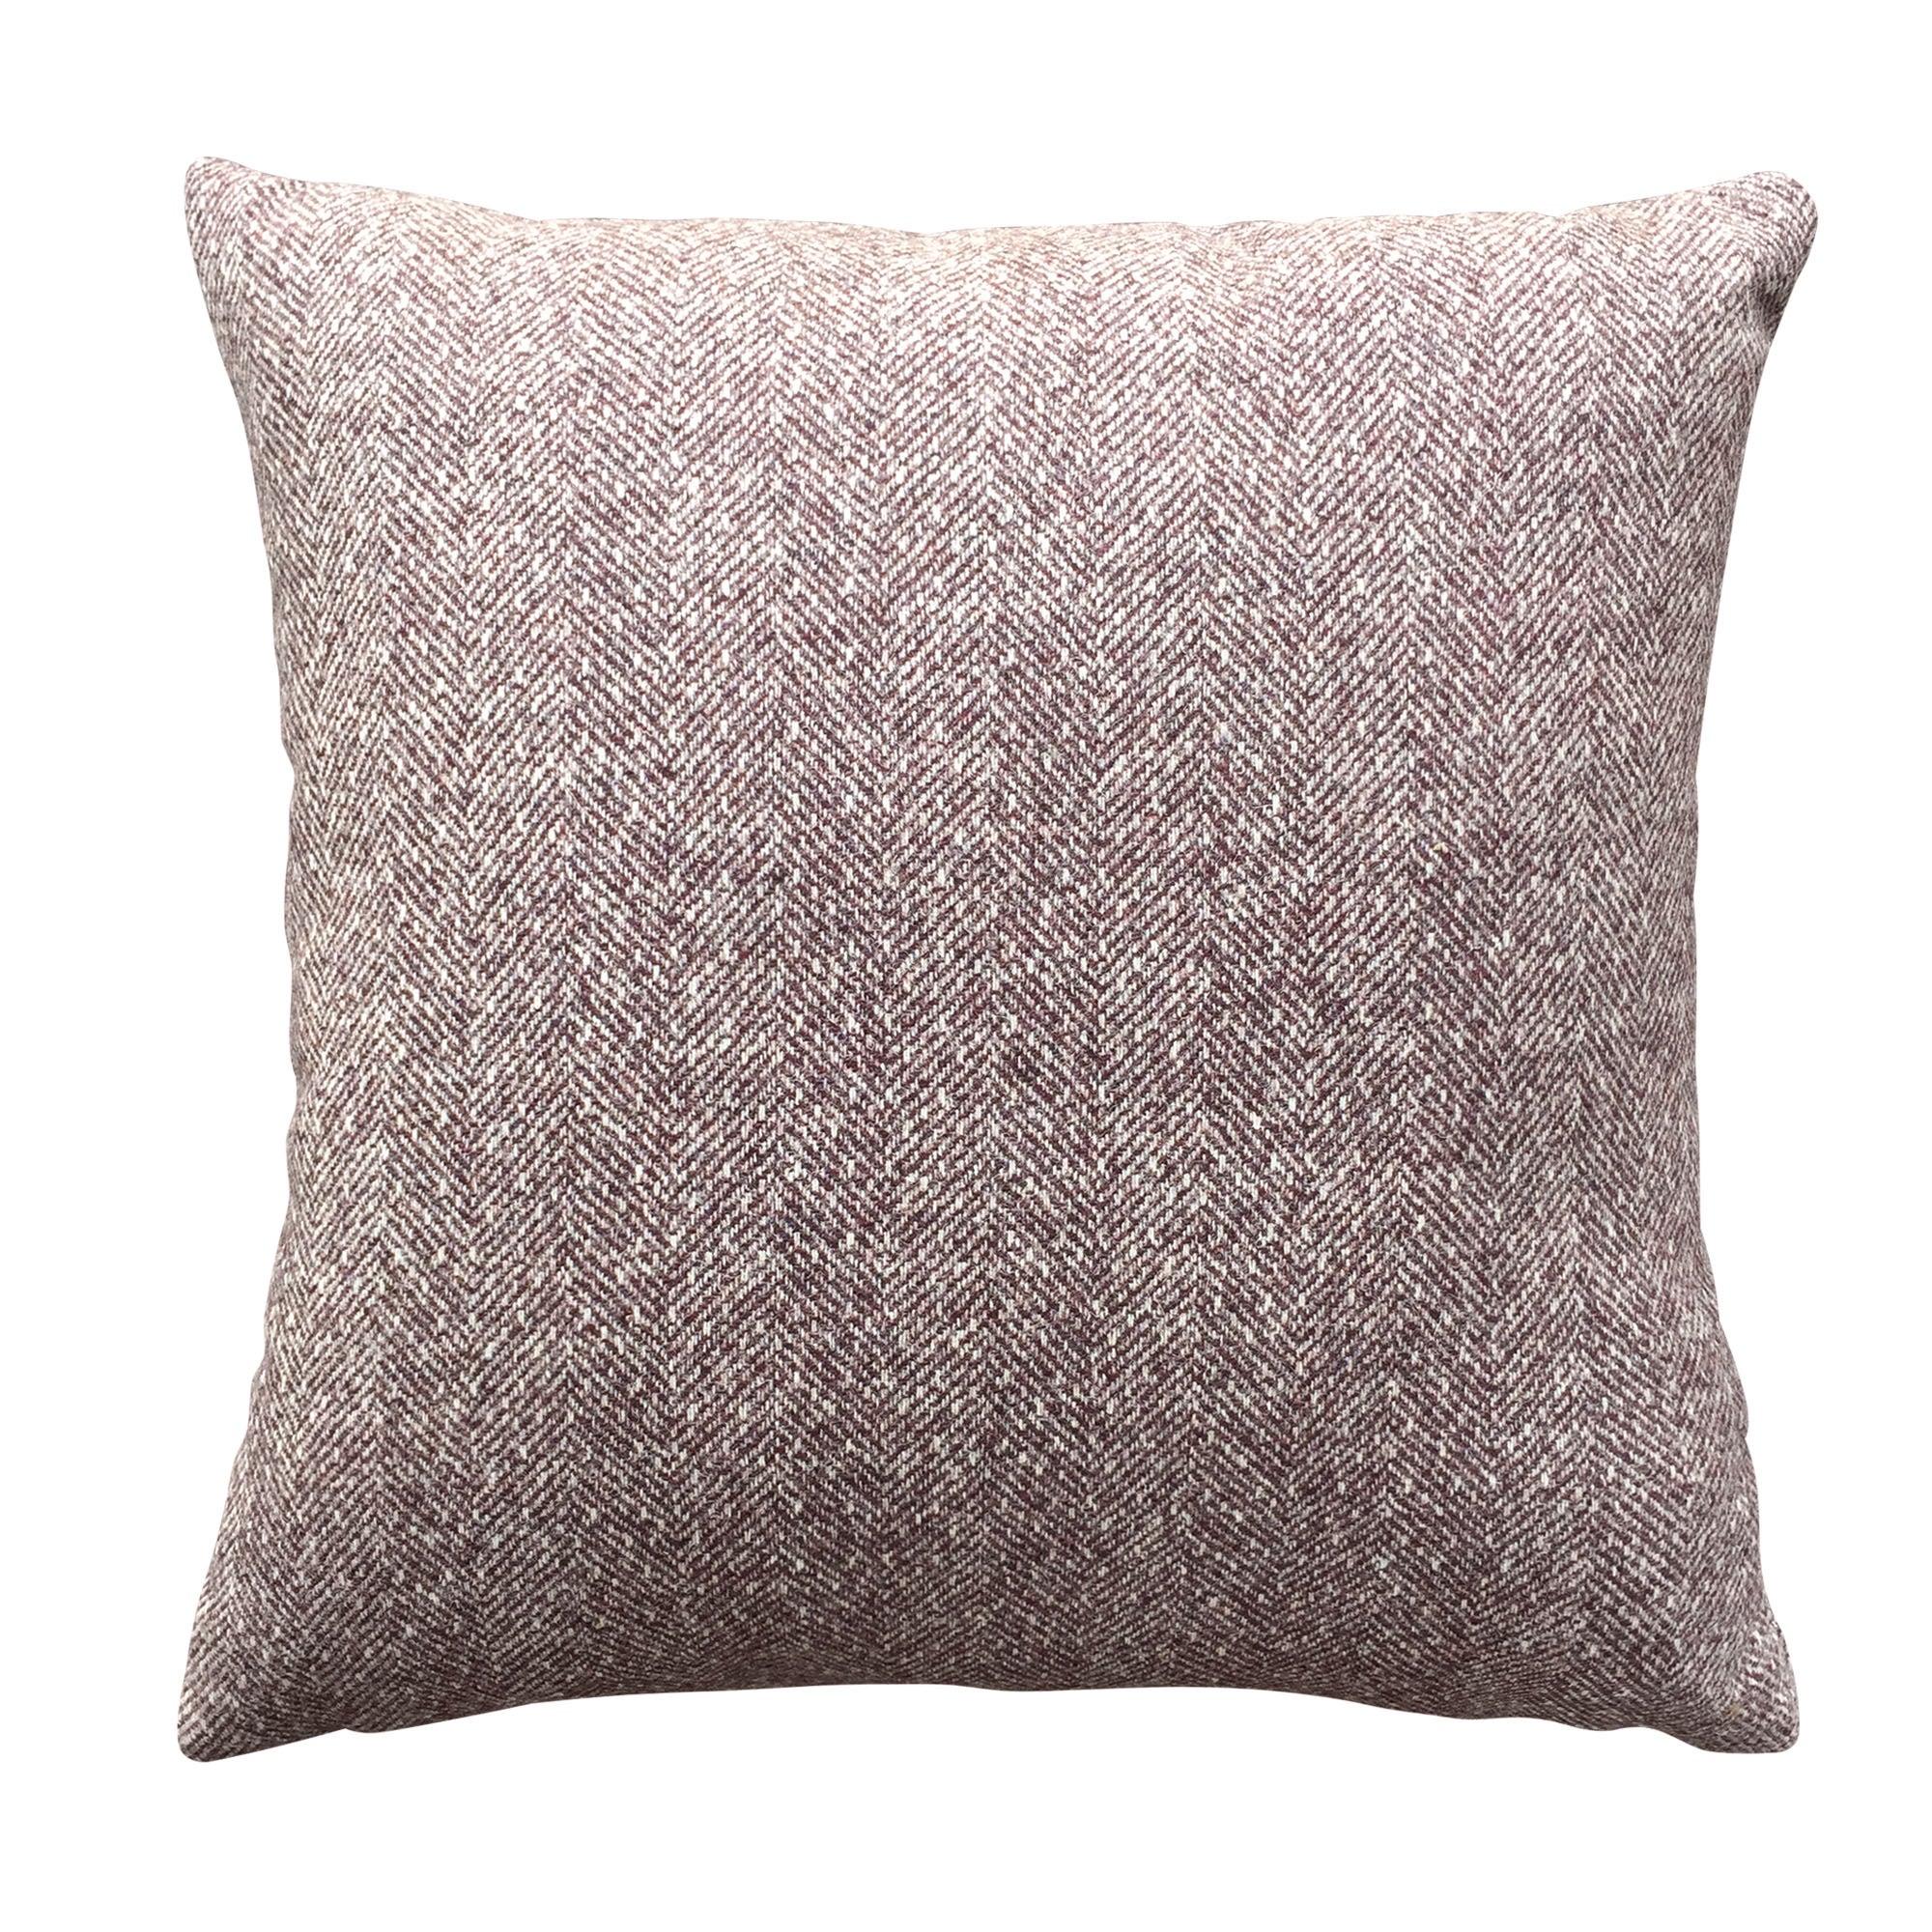 Image of 100% Wool Nico Plum Cushion Cover Plum Purple